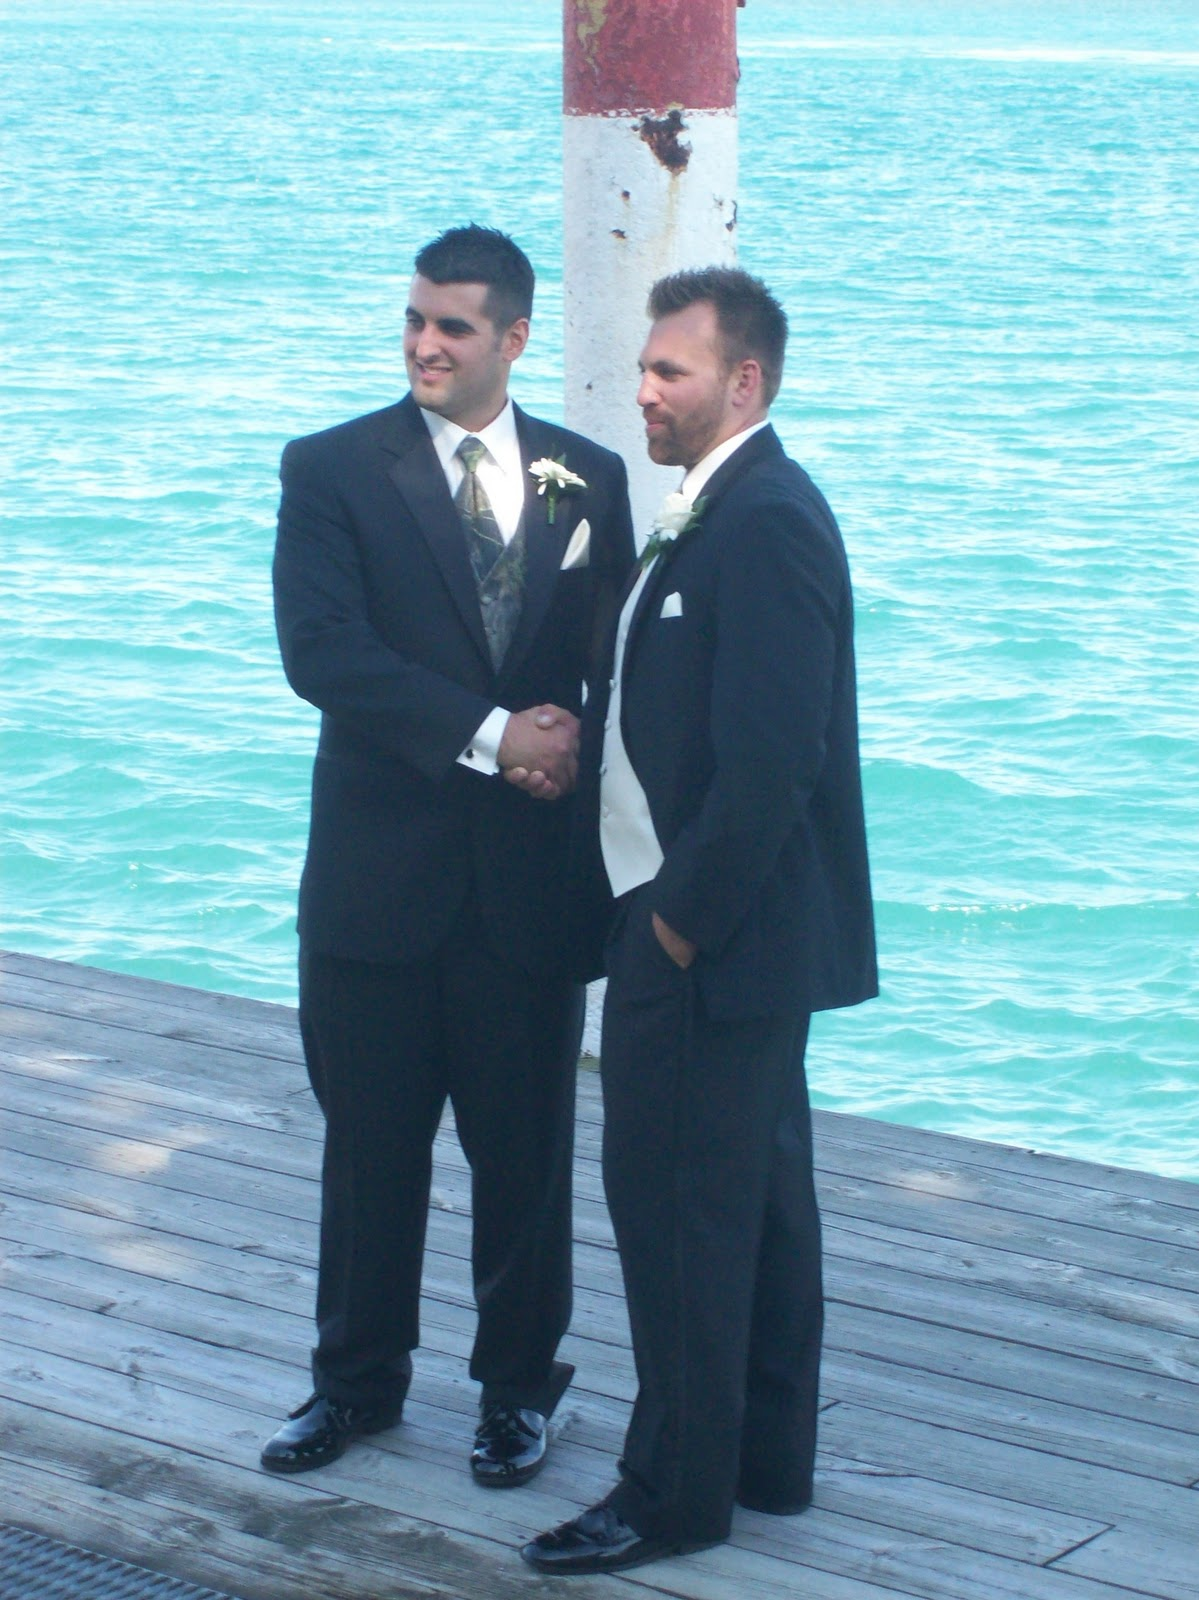 Detroit Michigan Wedding Planner Blog: November 2011